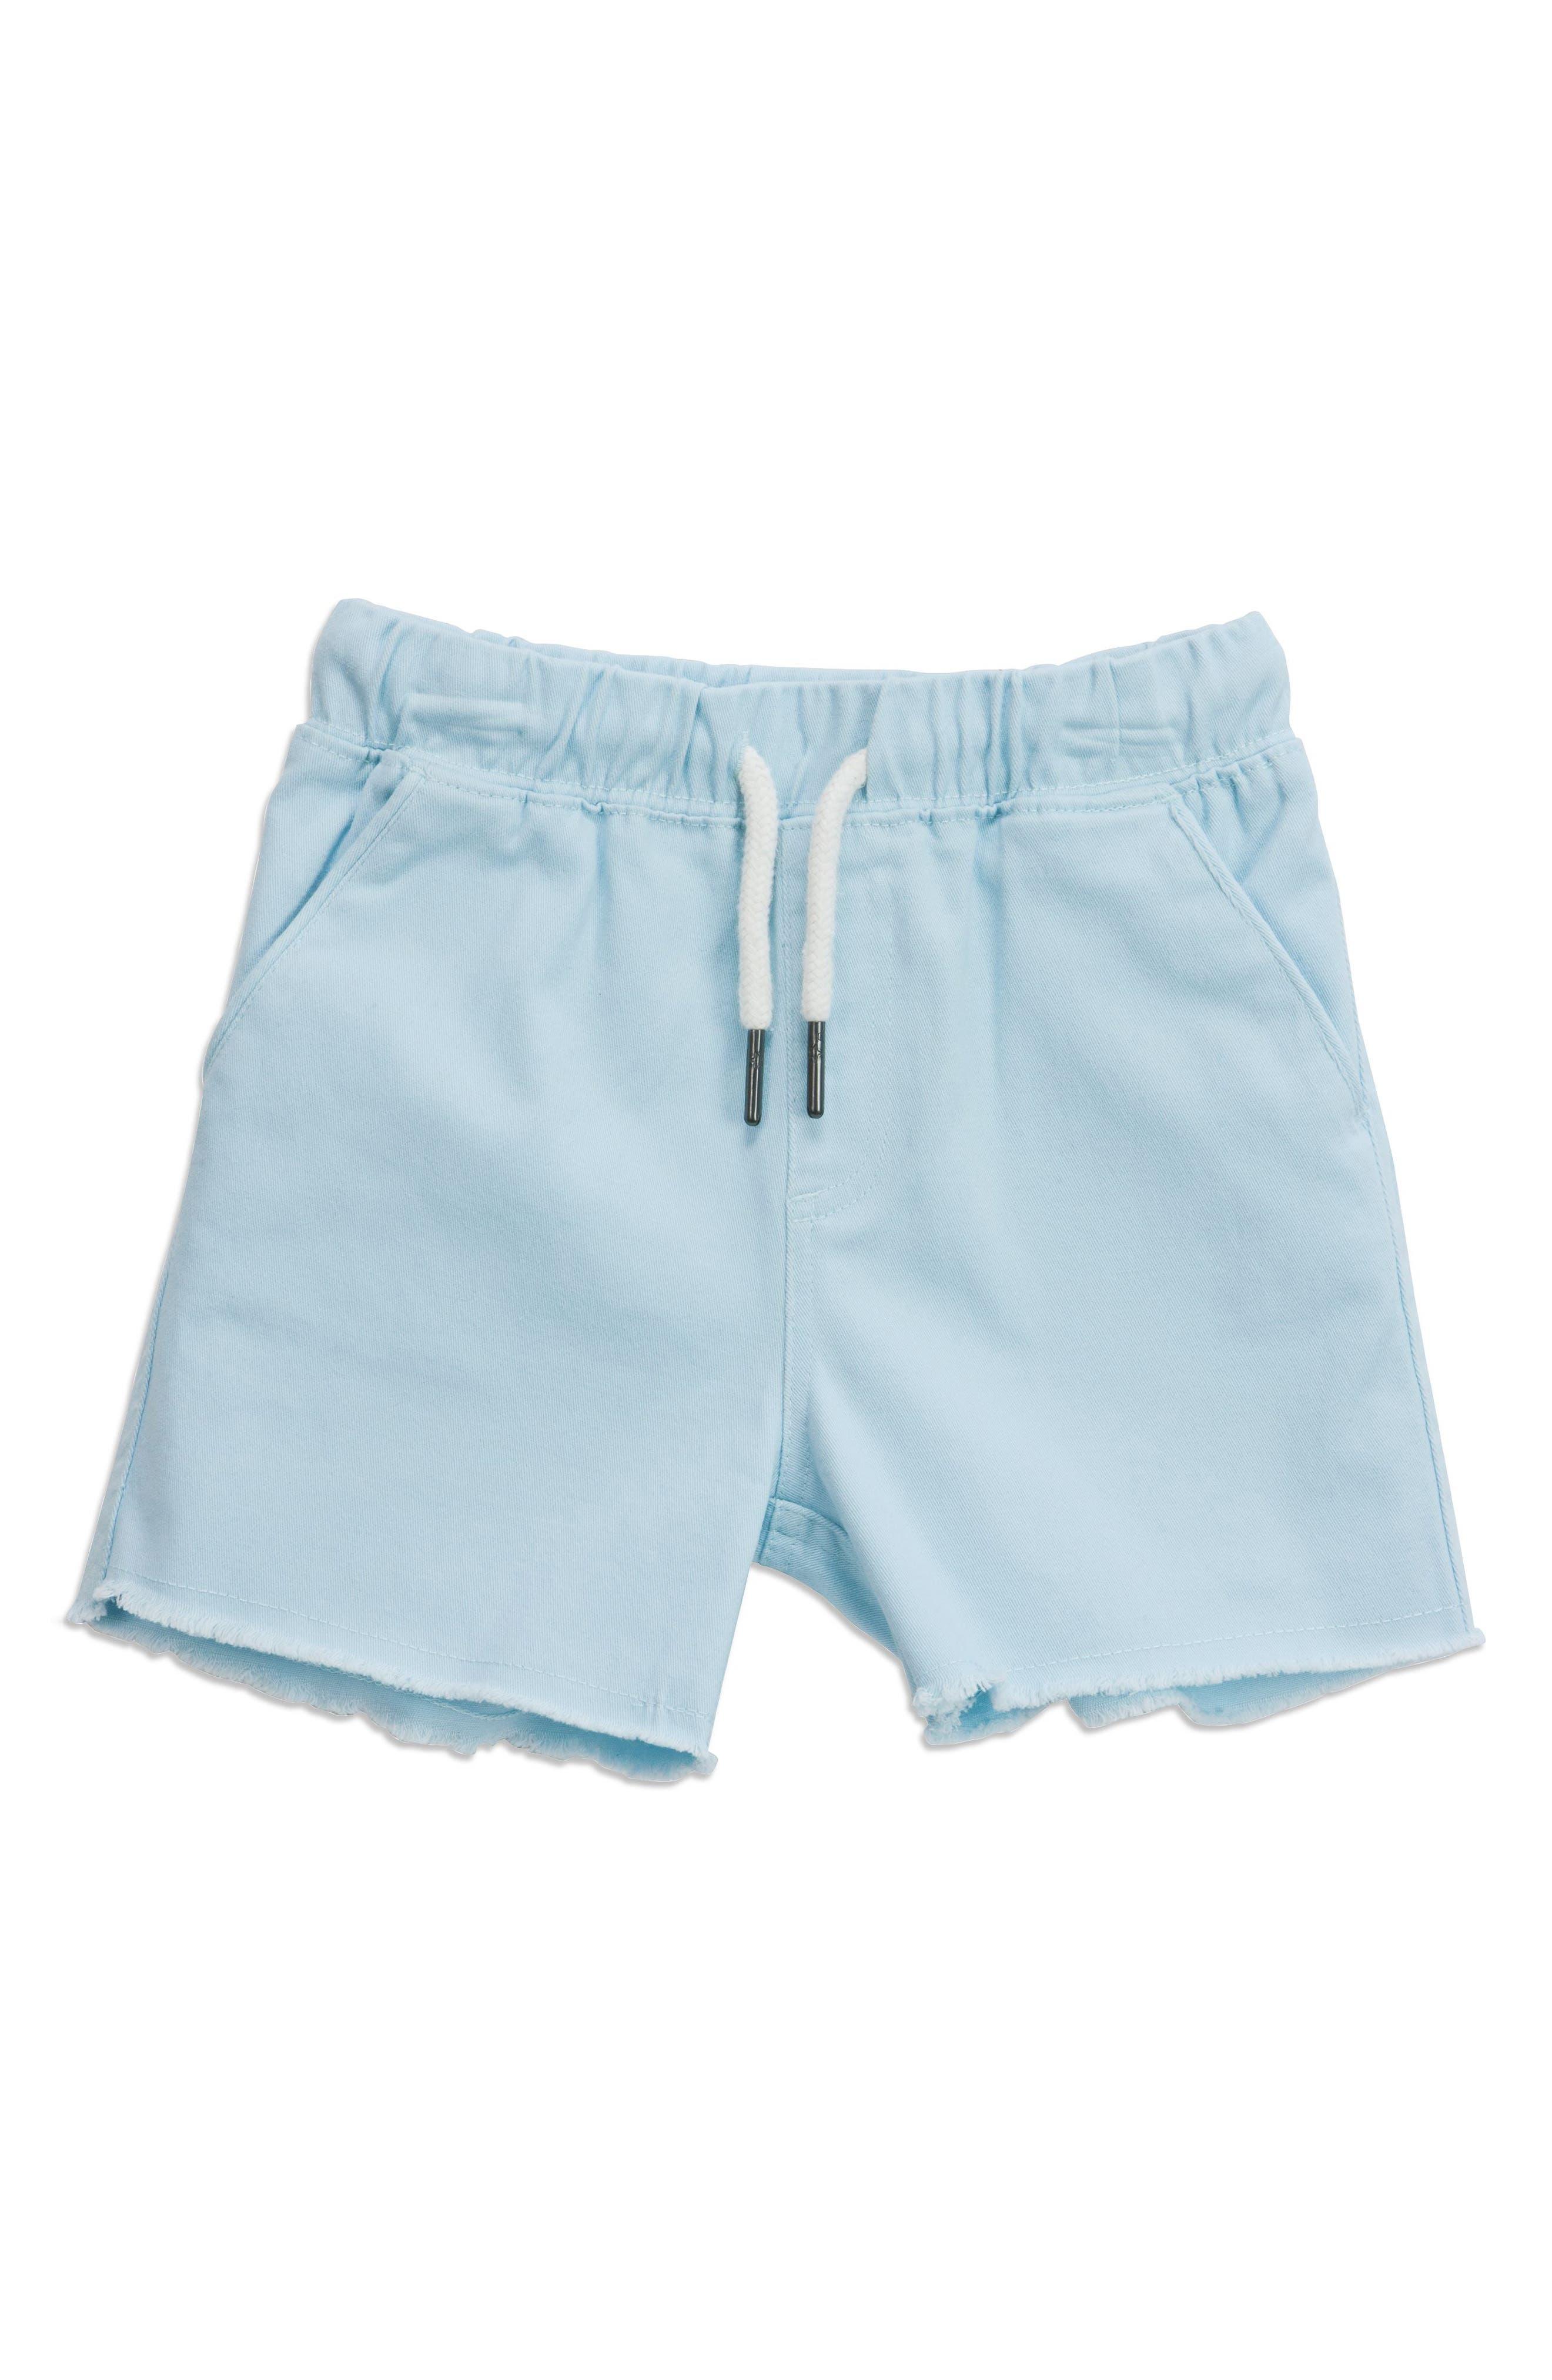 Alaska Shorts,                         Main,                         color, Light Blue